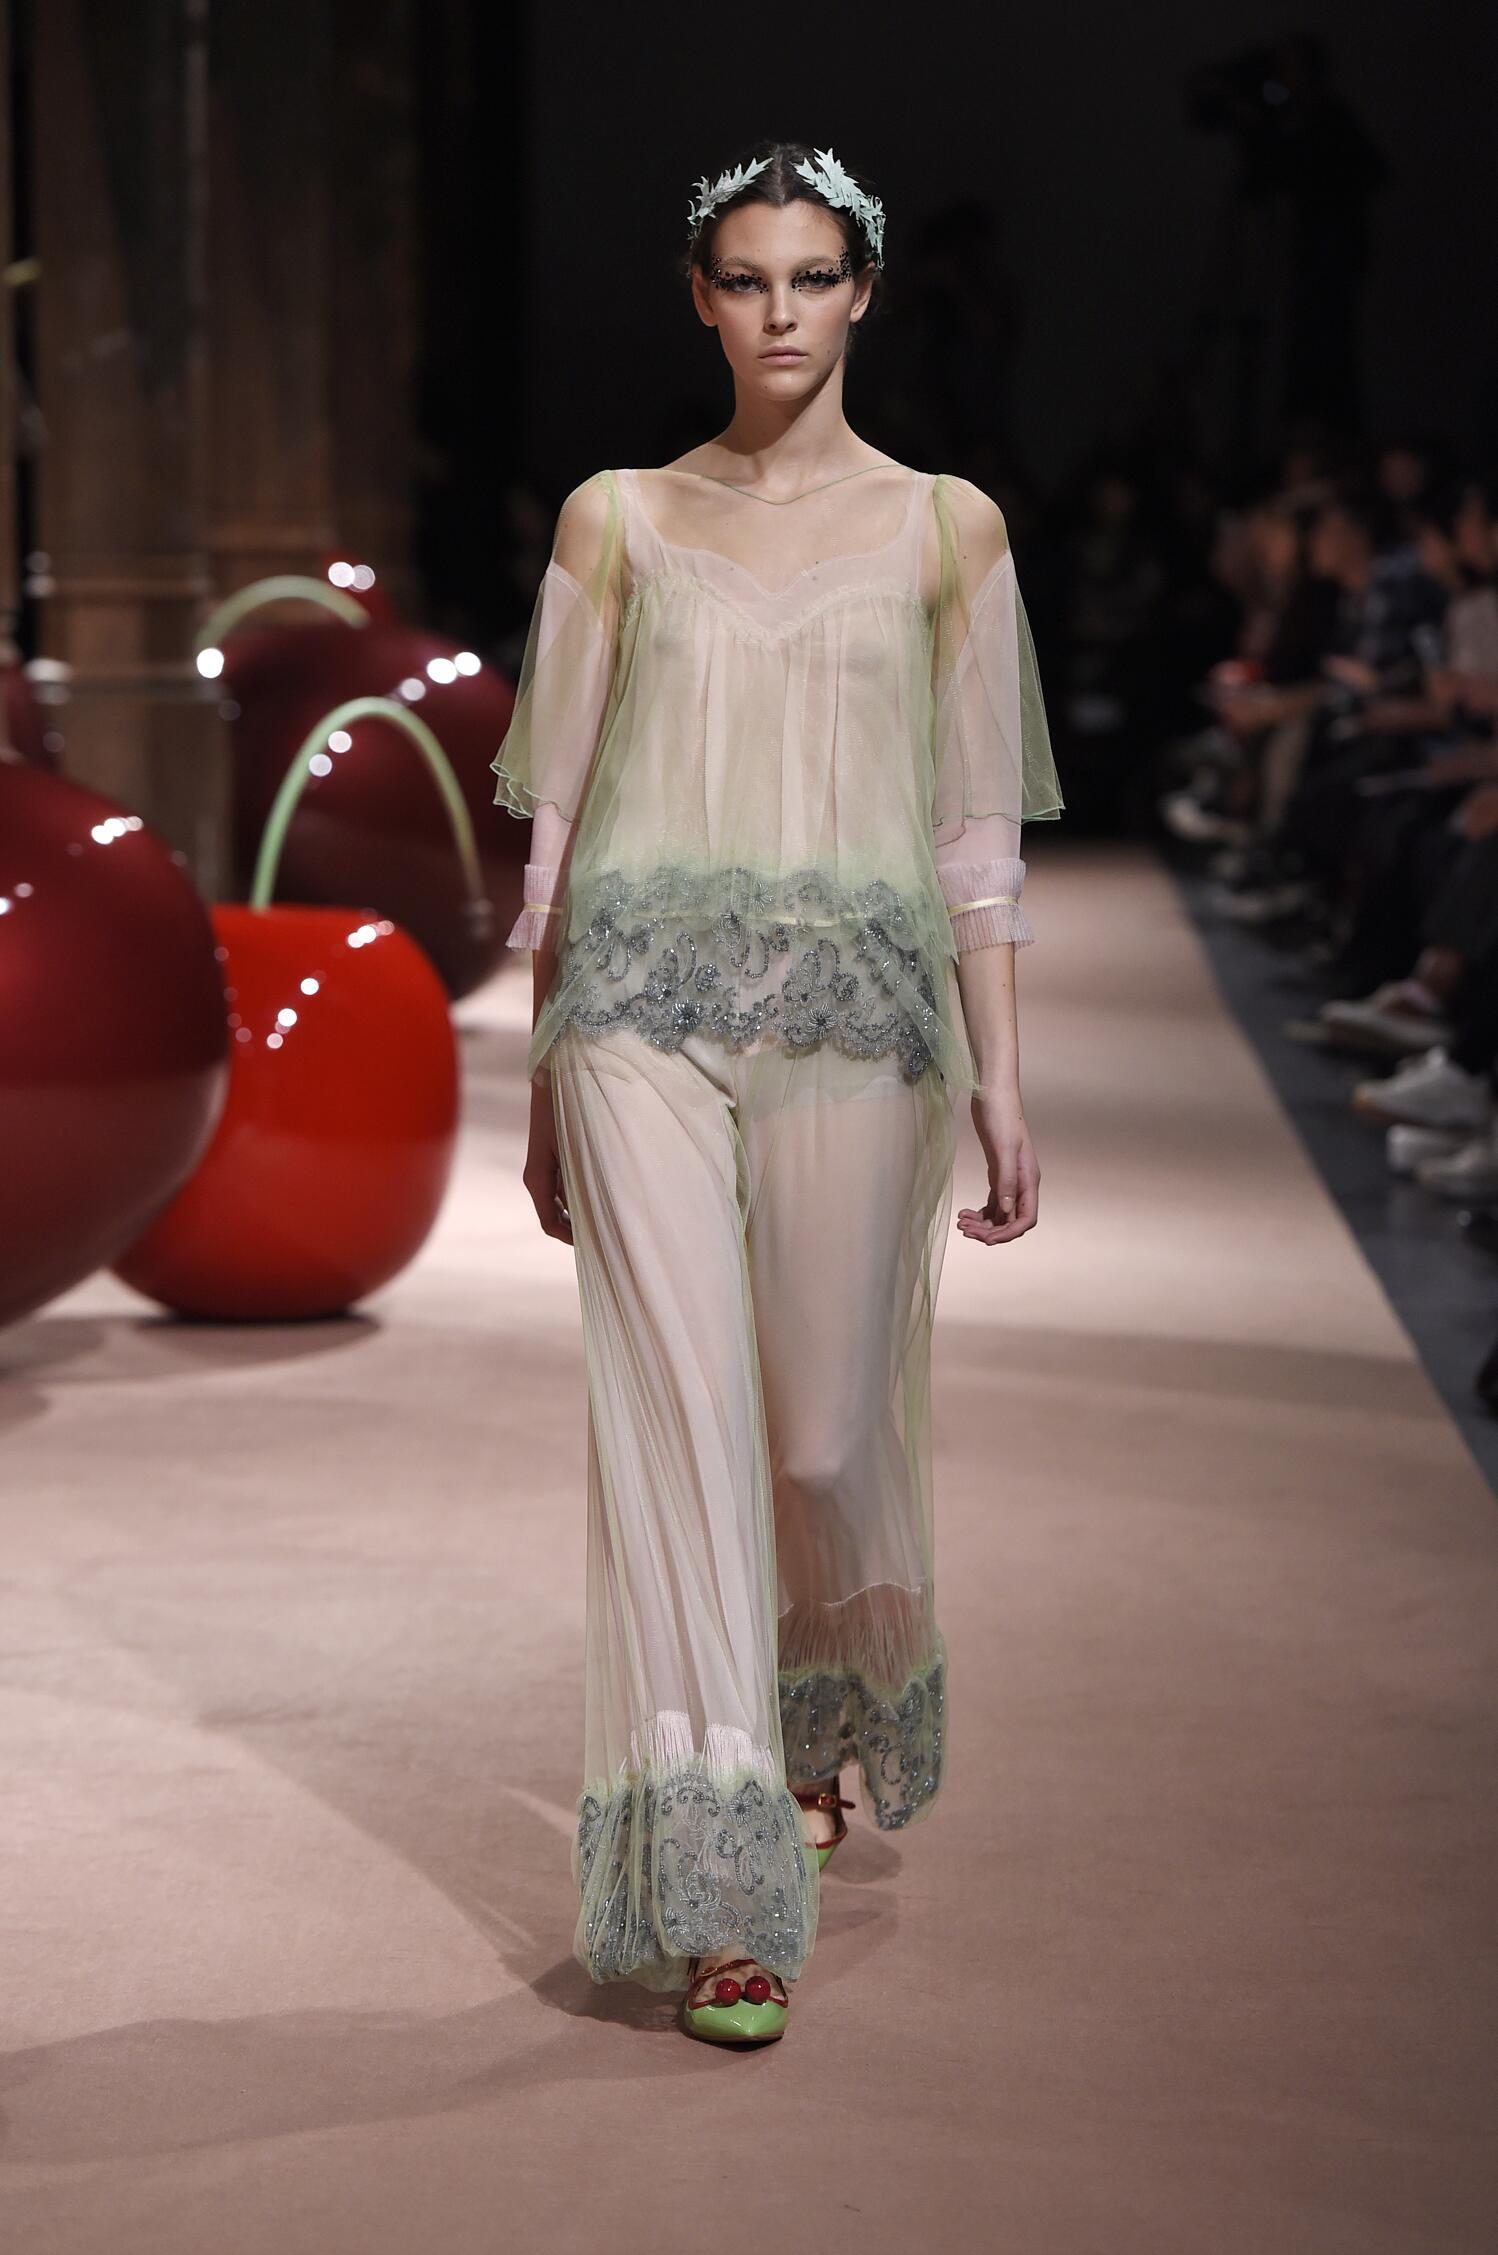 Spring Summer 2015 Fashion Model Undercover